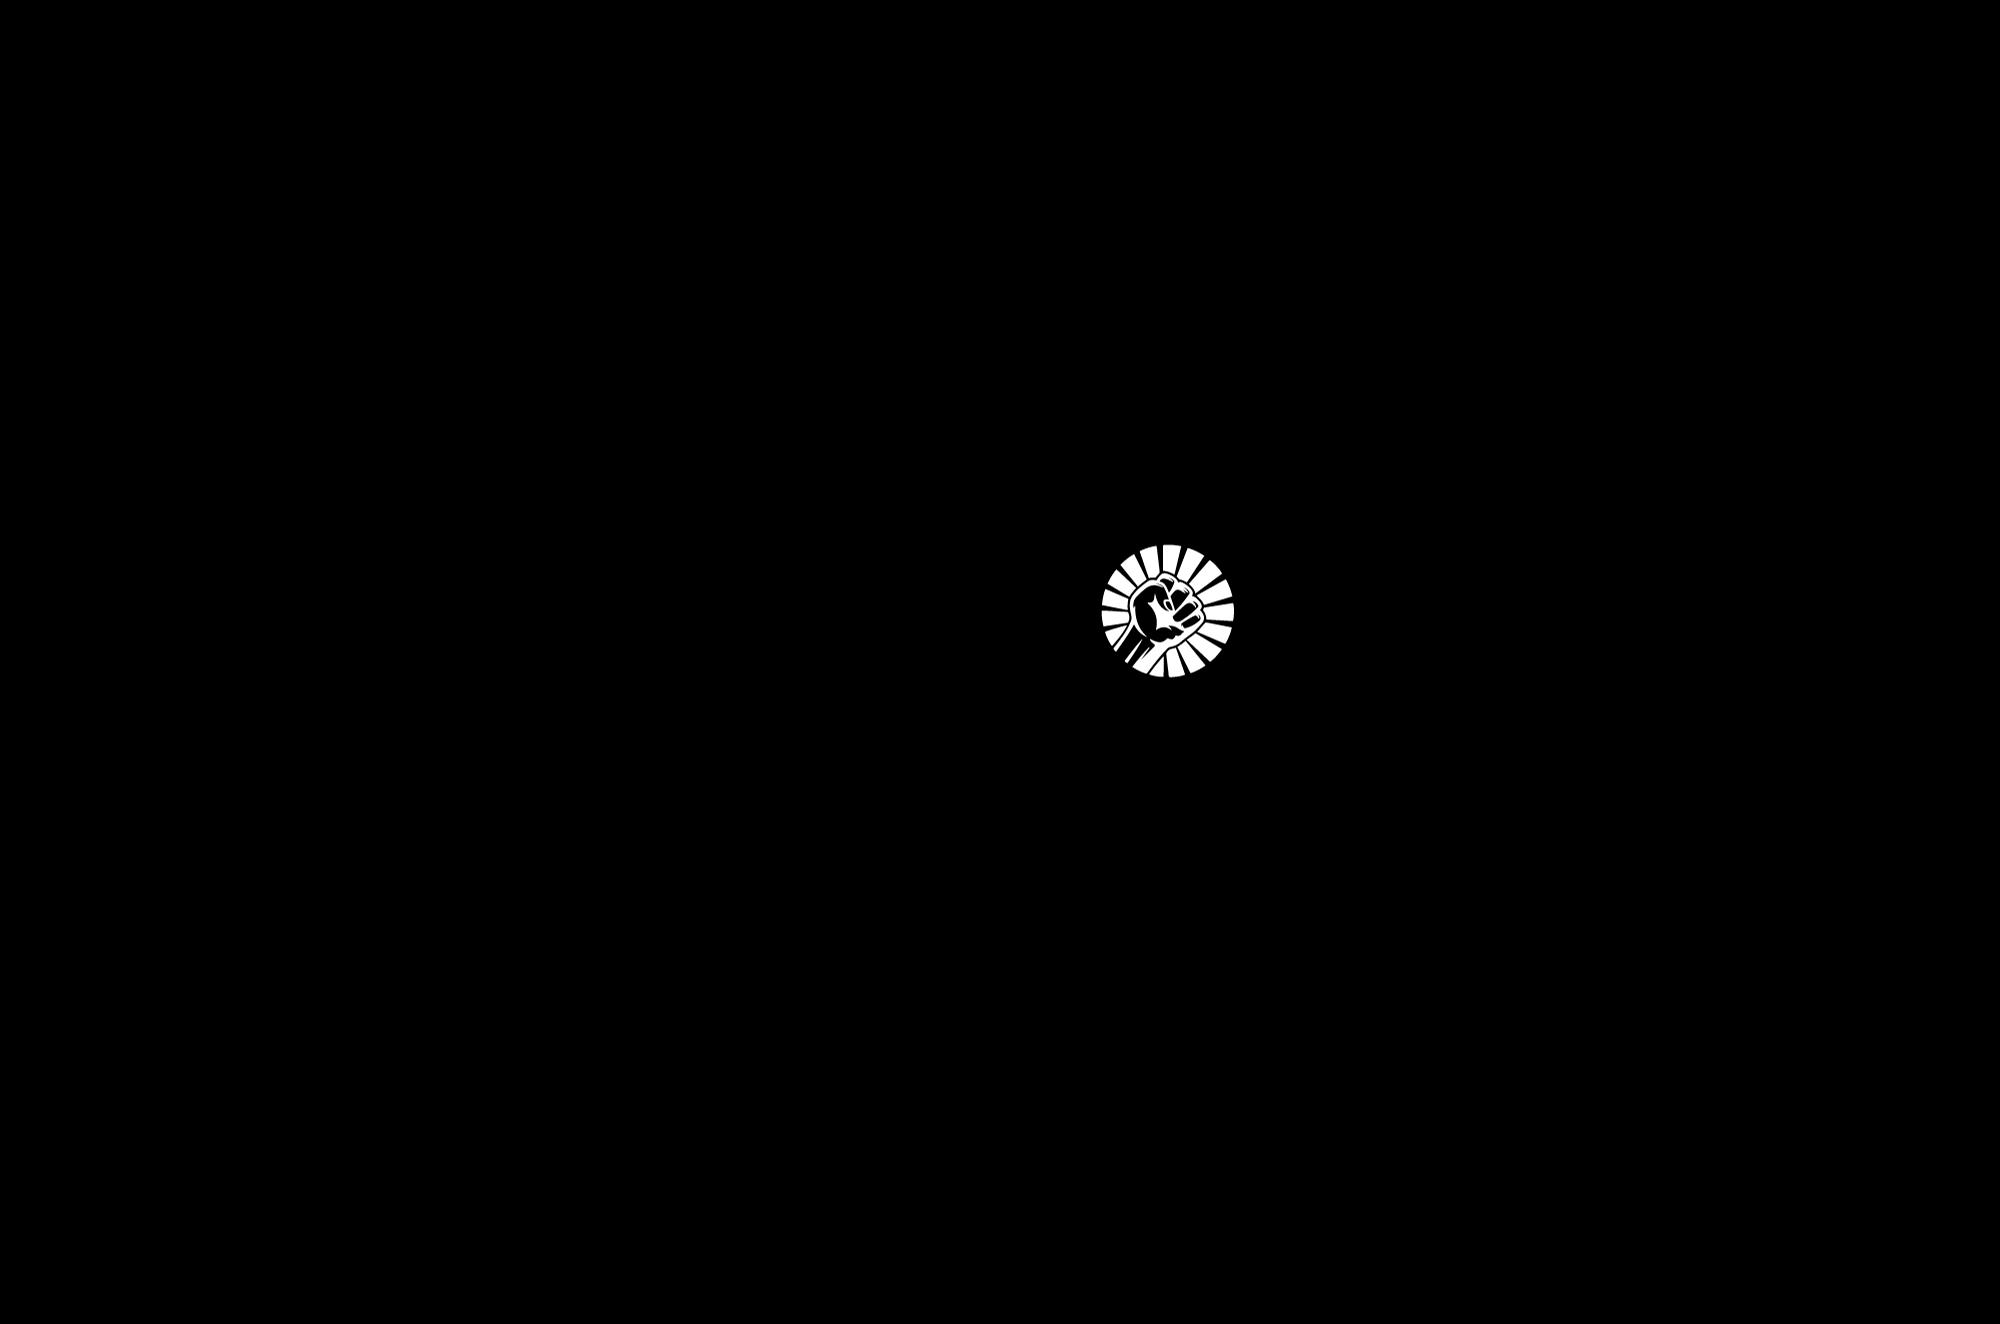 ActionSTL(no arch)transparent (2).png